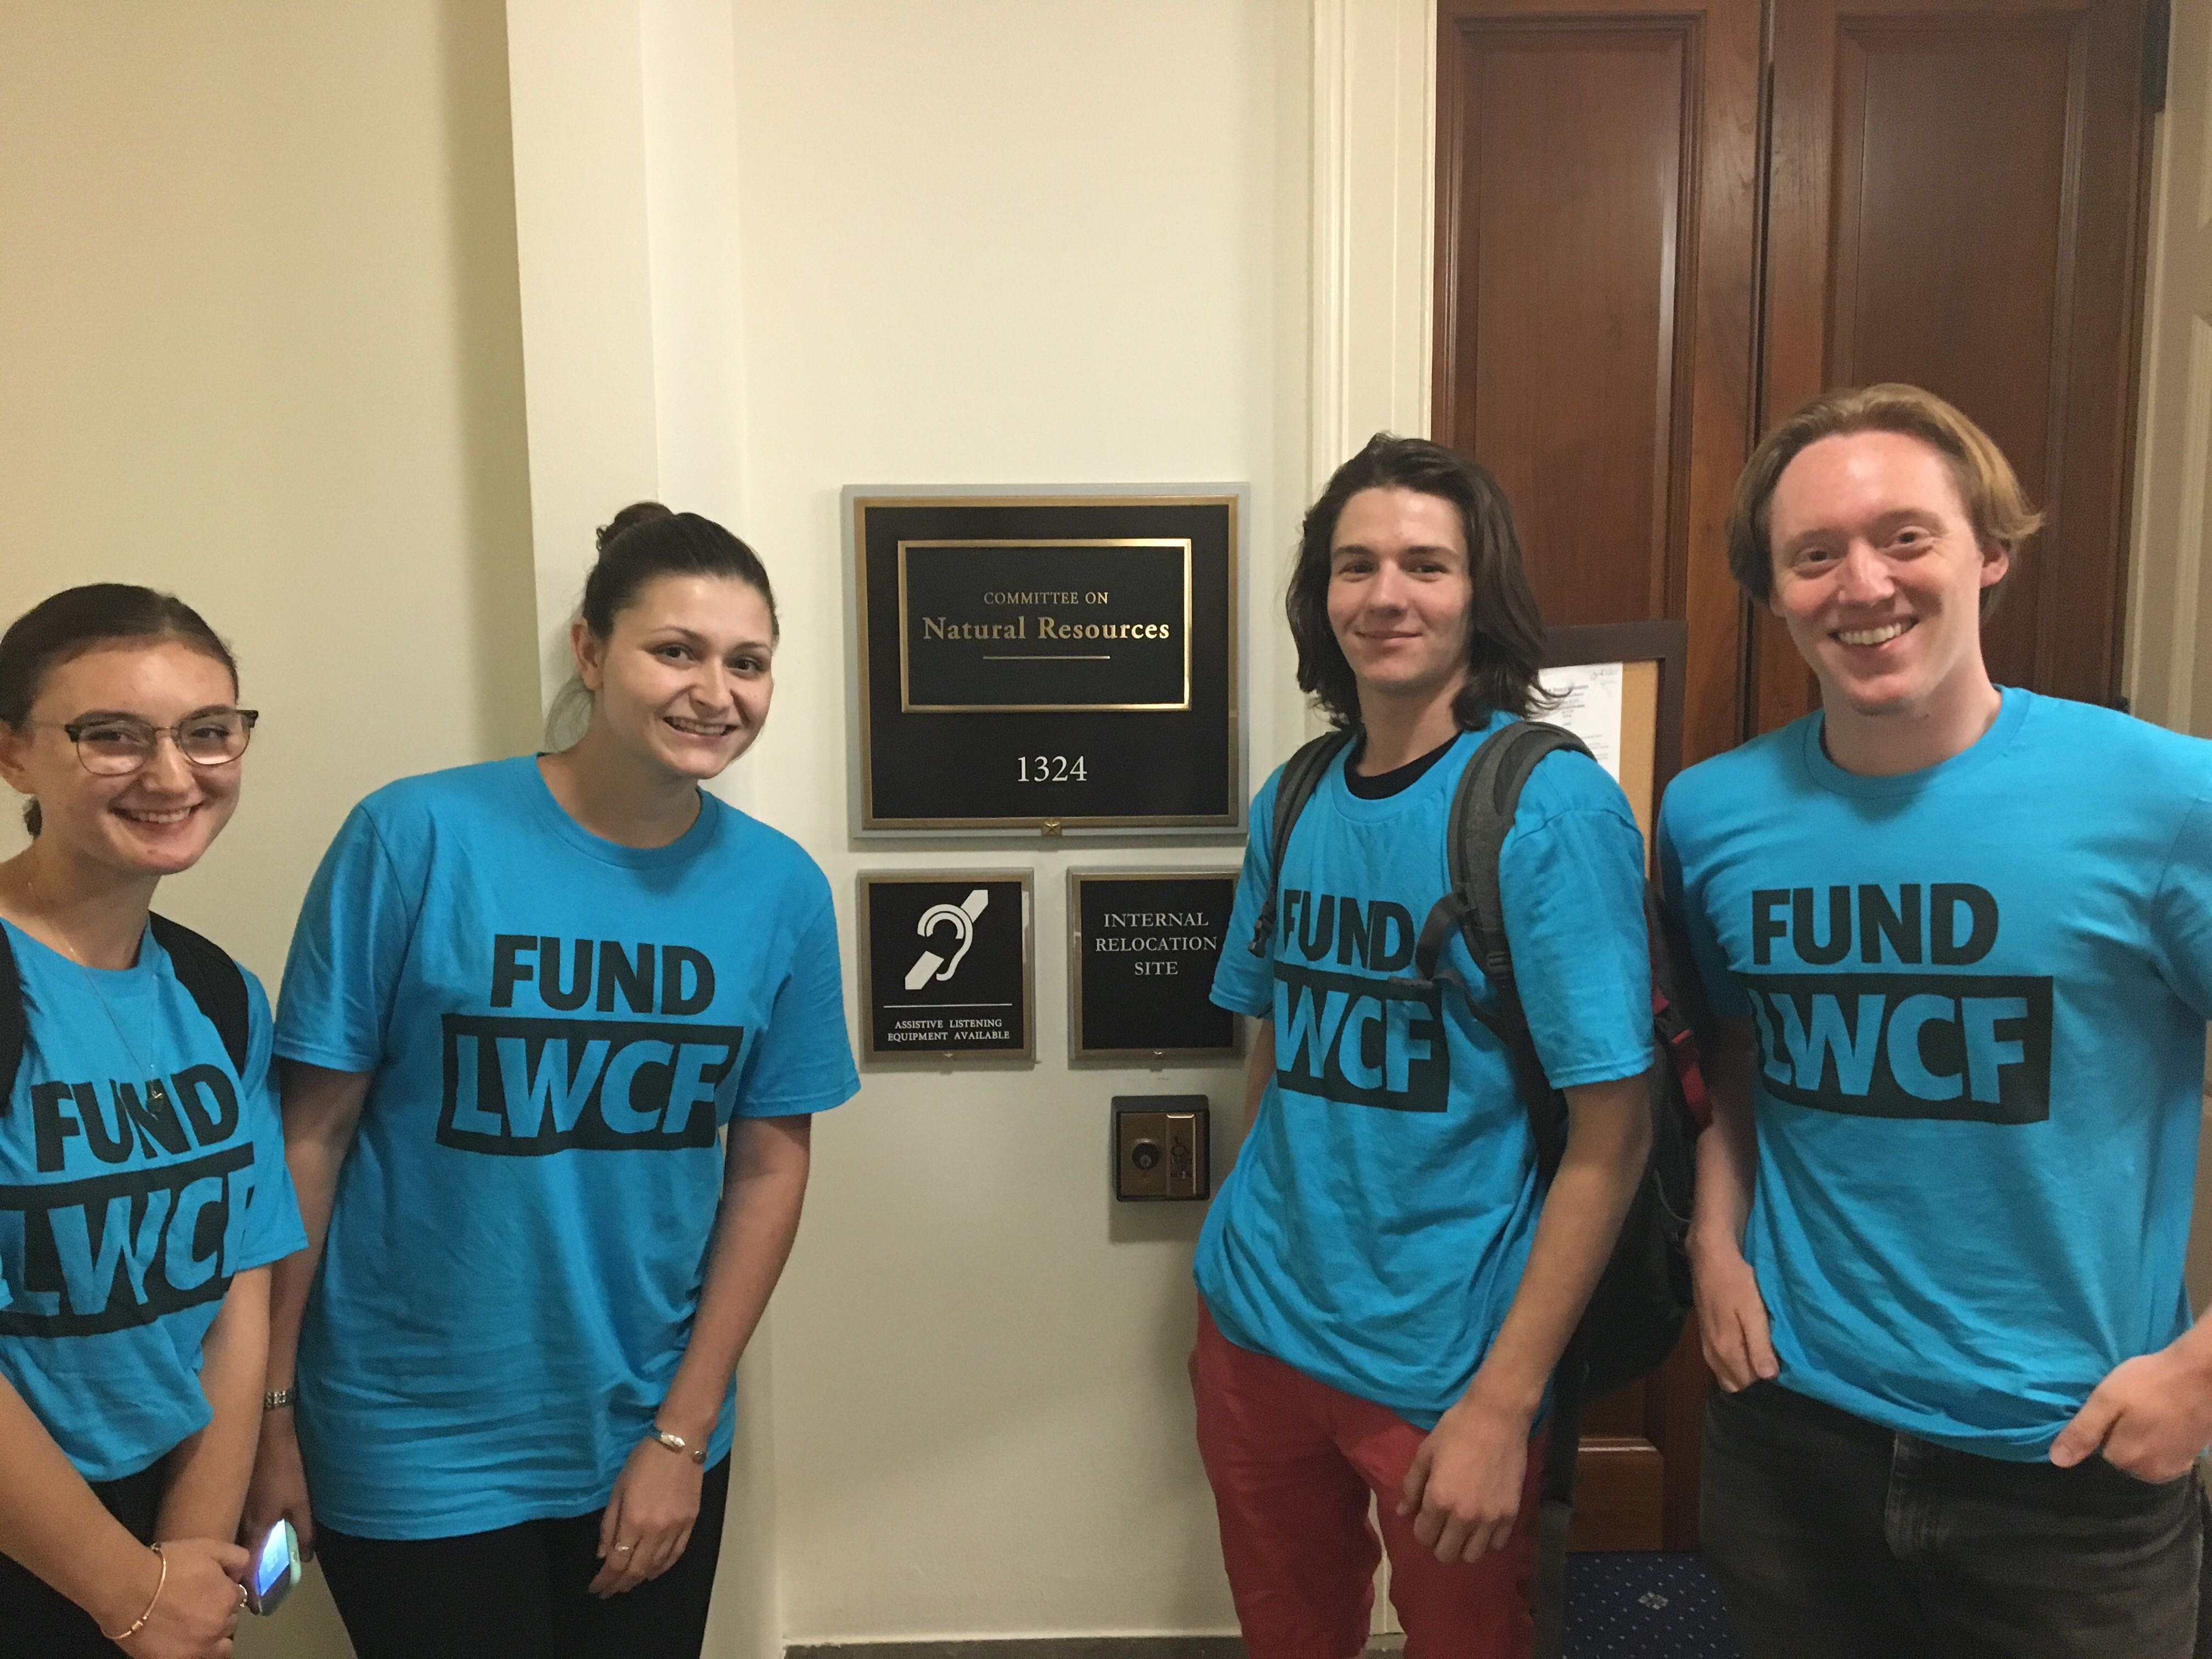 Fund the LWCF!